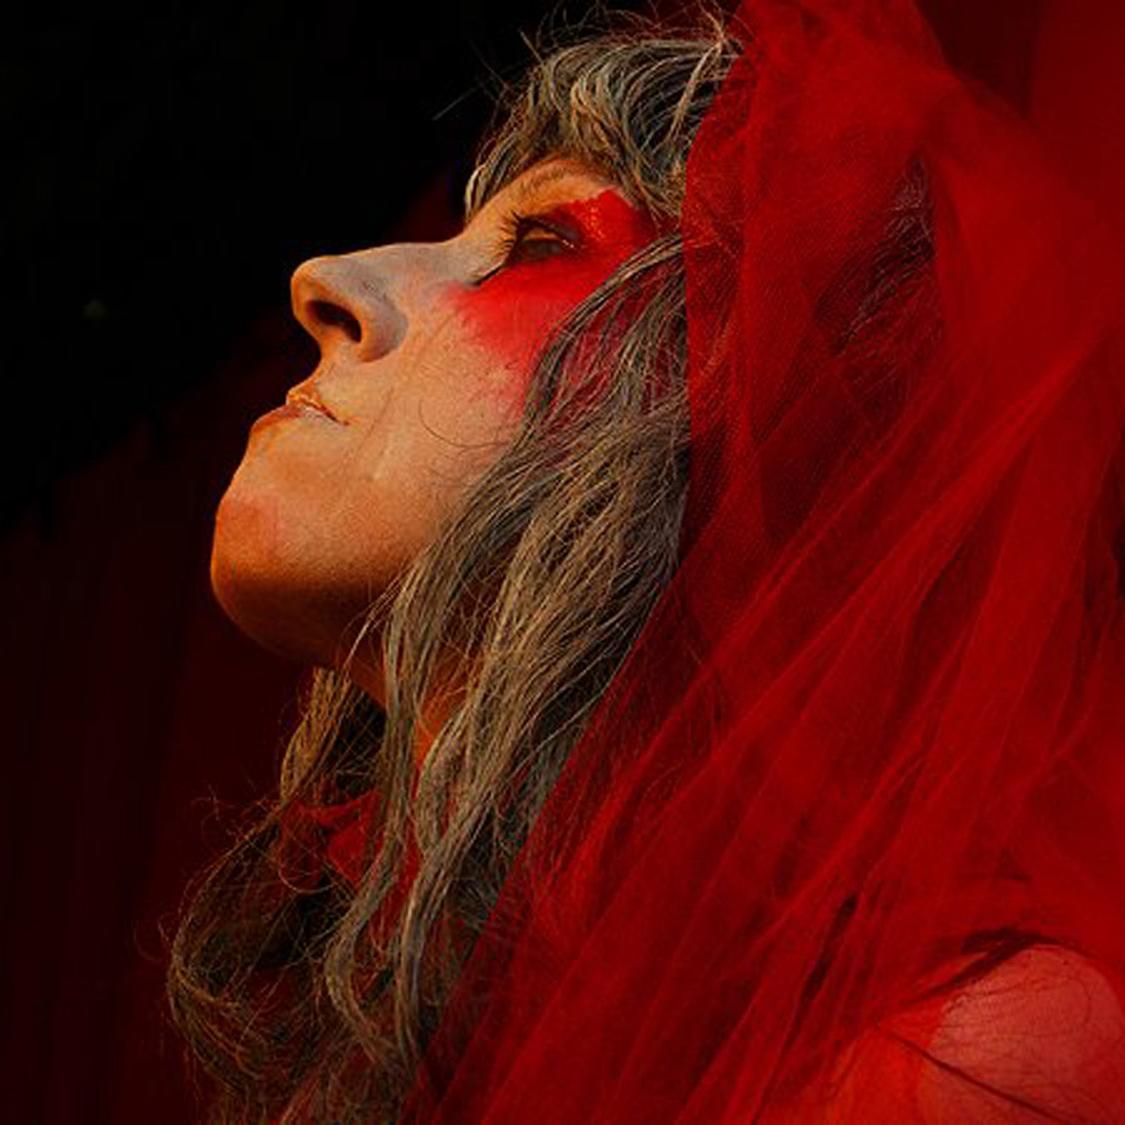 Photograph by Teague Clements